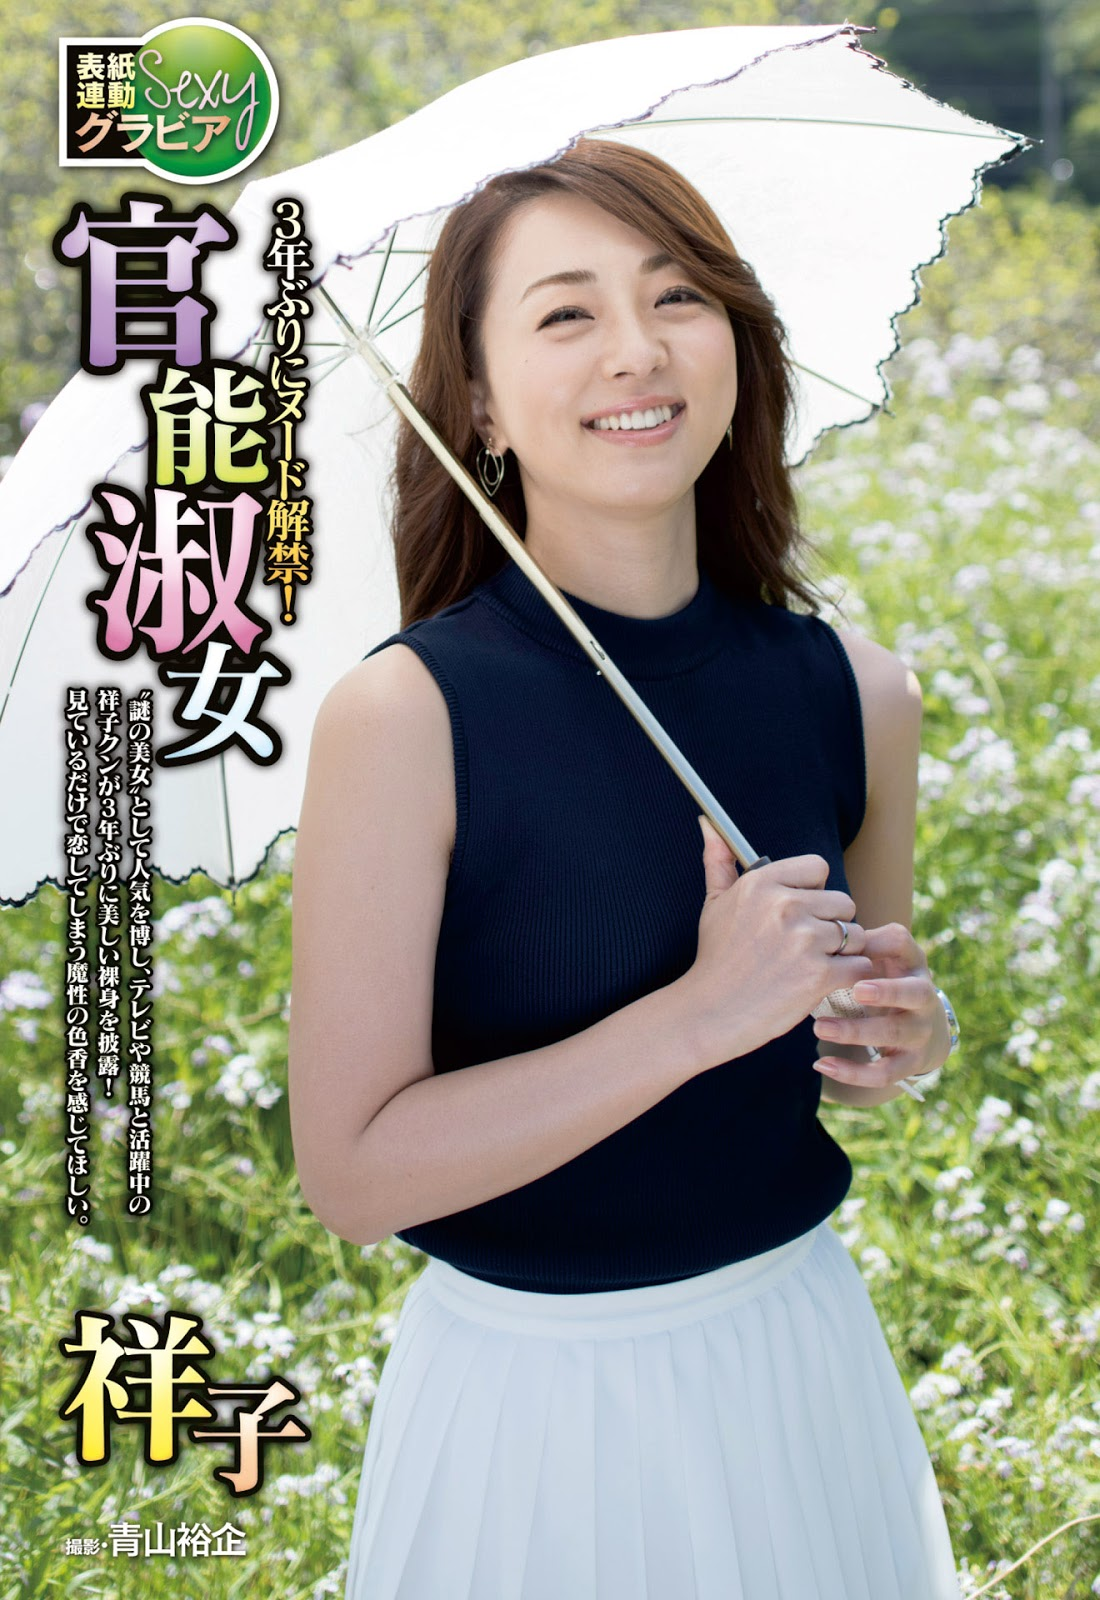 Shōko 祥子, Shukan Jitsuwa 2017.08.10 (週刊実話 2017年08月10日号)